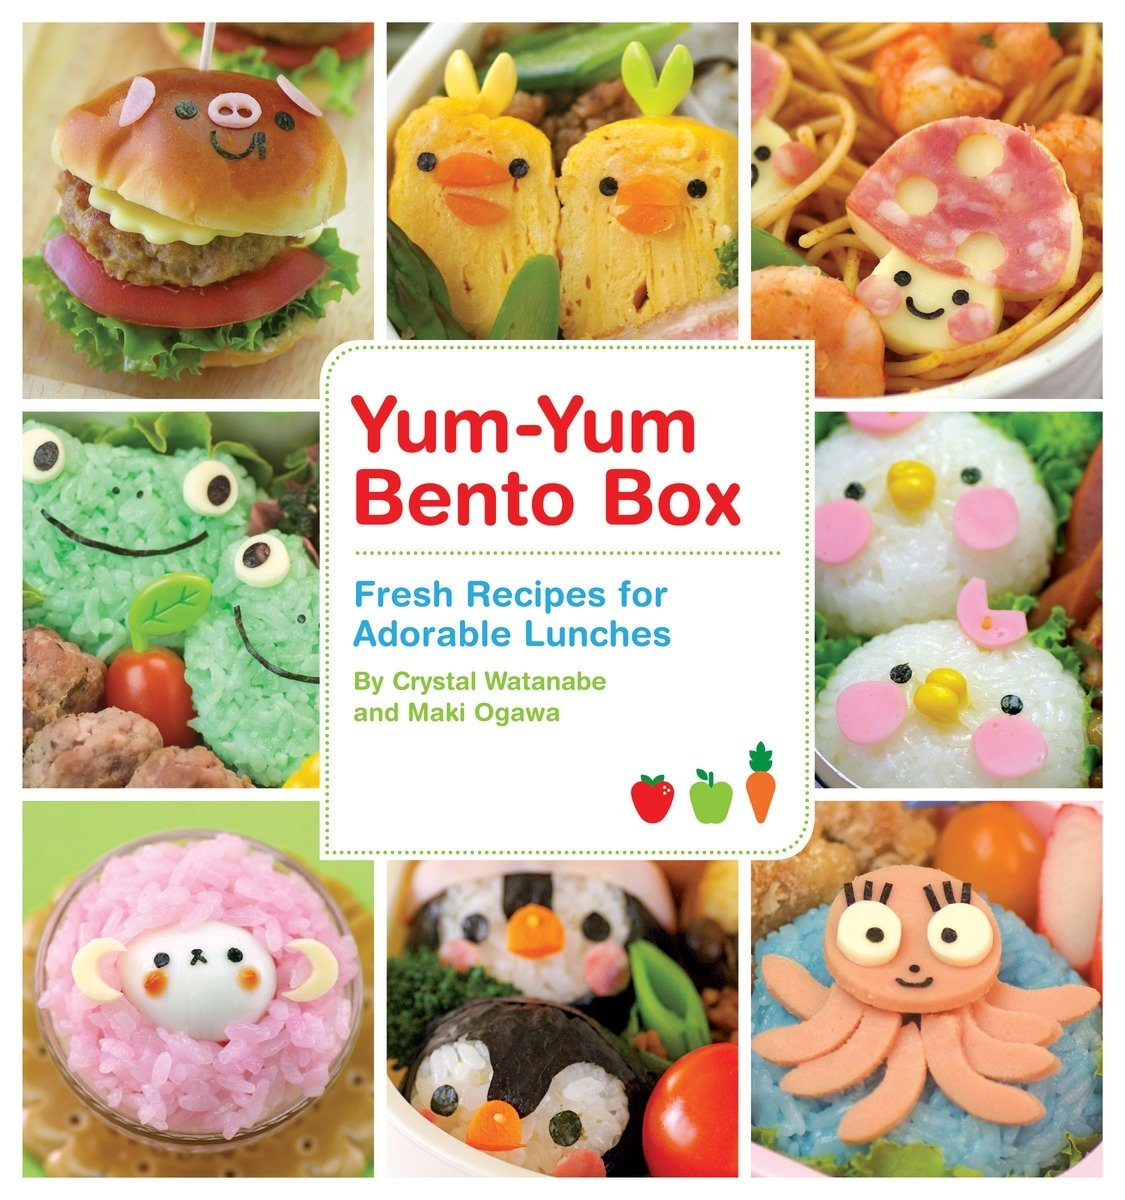 Yum Yum Bento Box Recipes Adorable product image